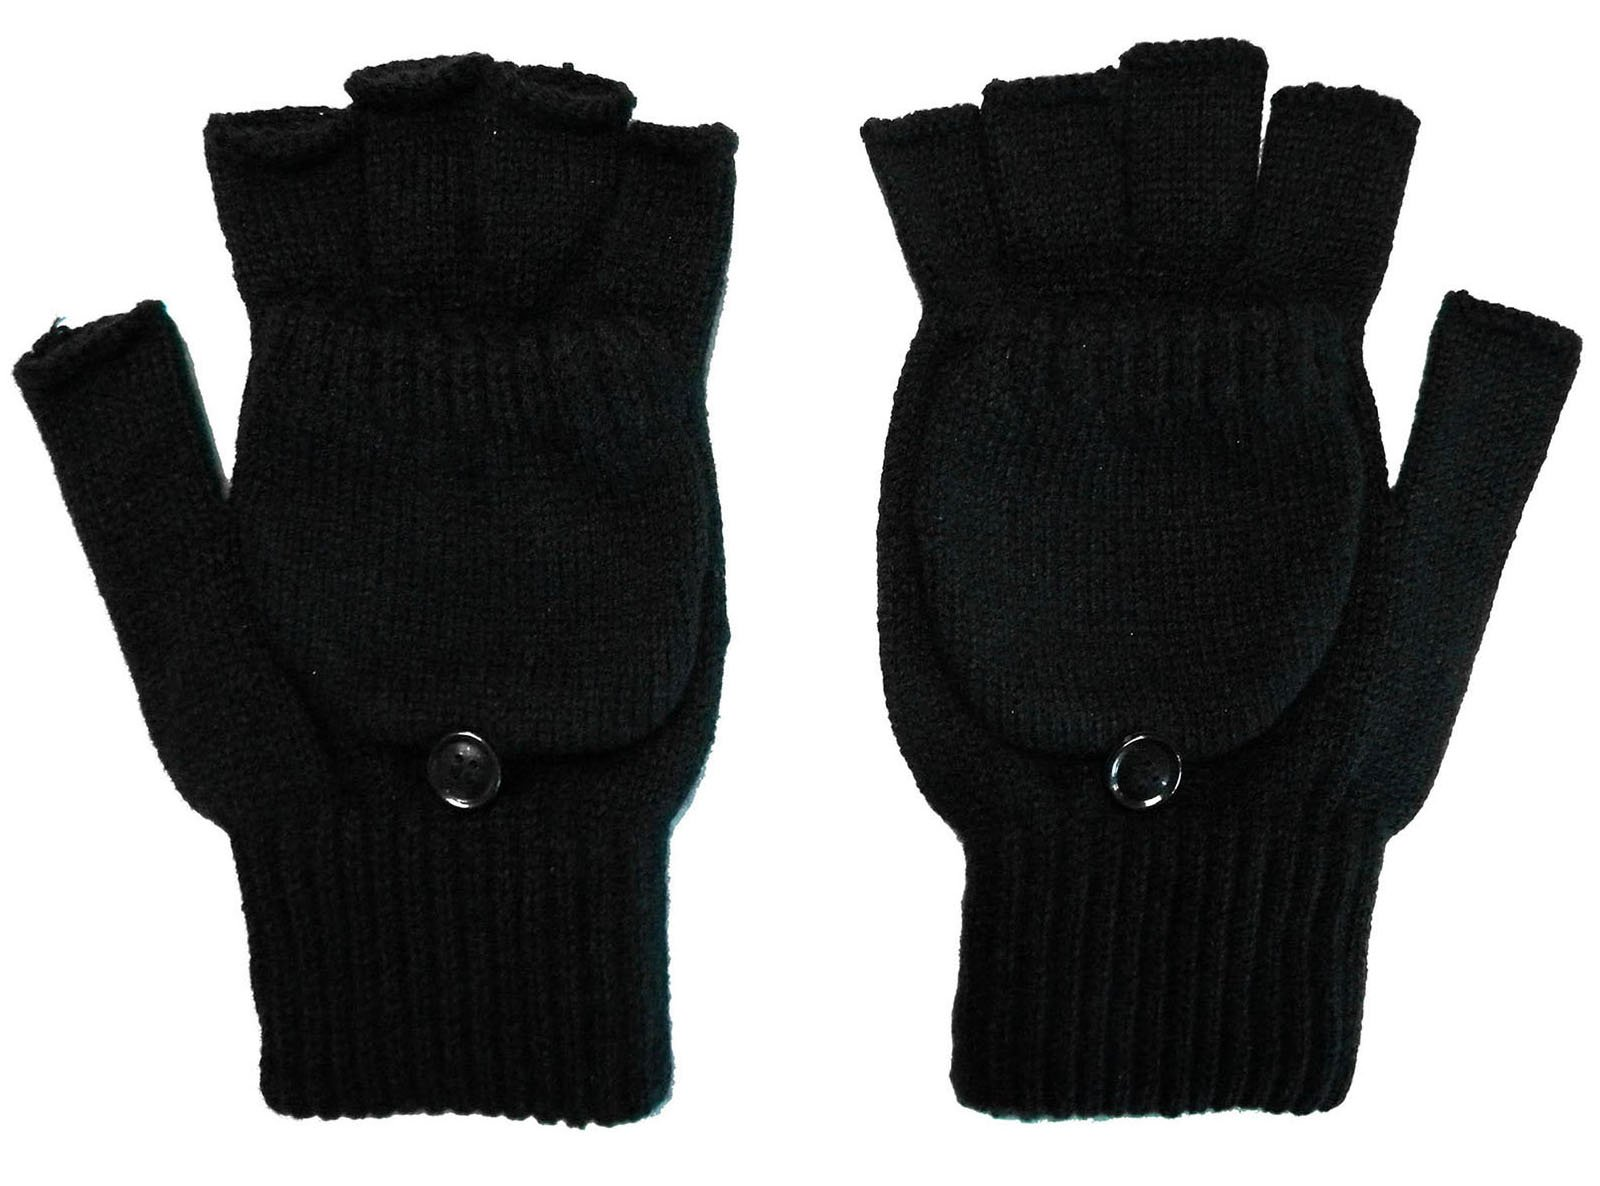 Womens Mens Winter Warm Knitted Convertible Fingerless Gloves W/Mitten Cover